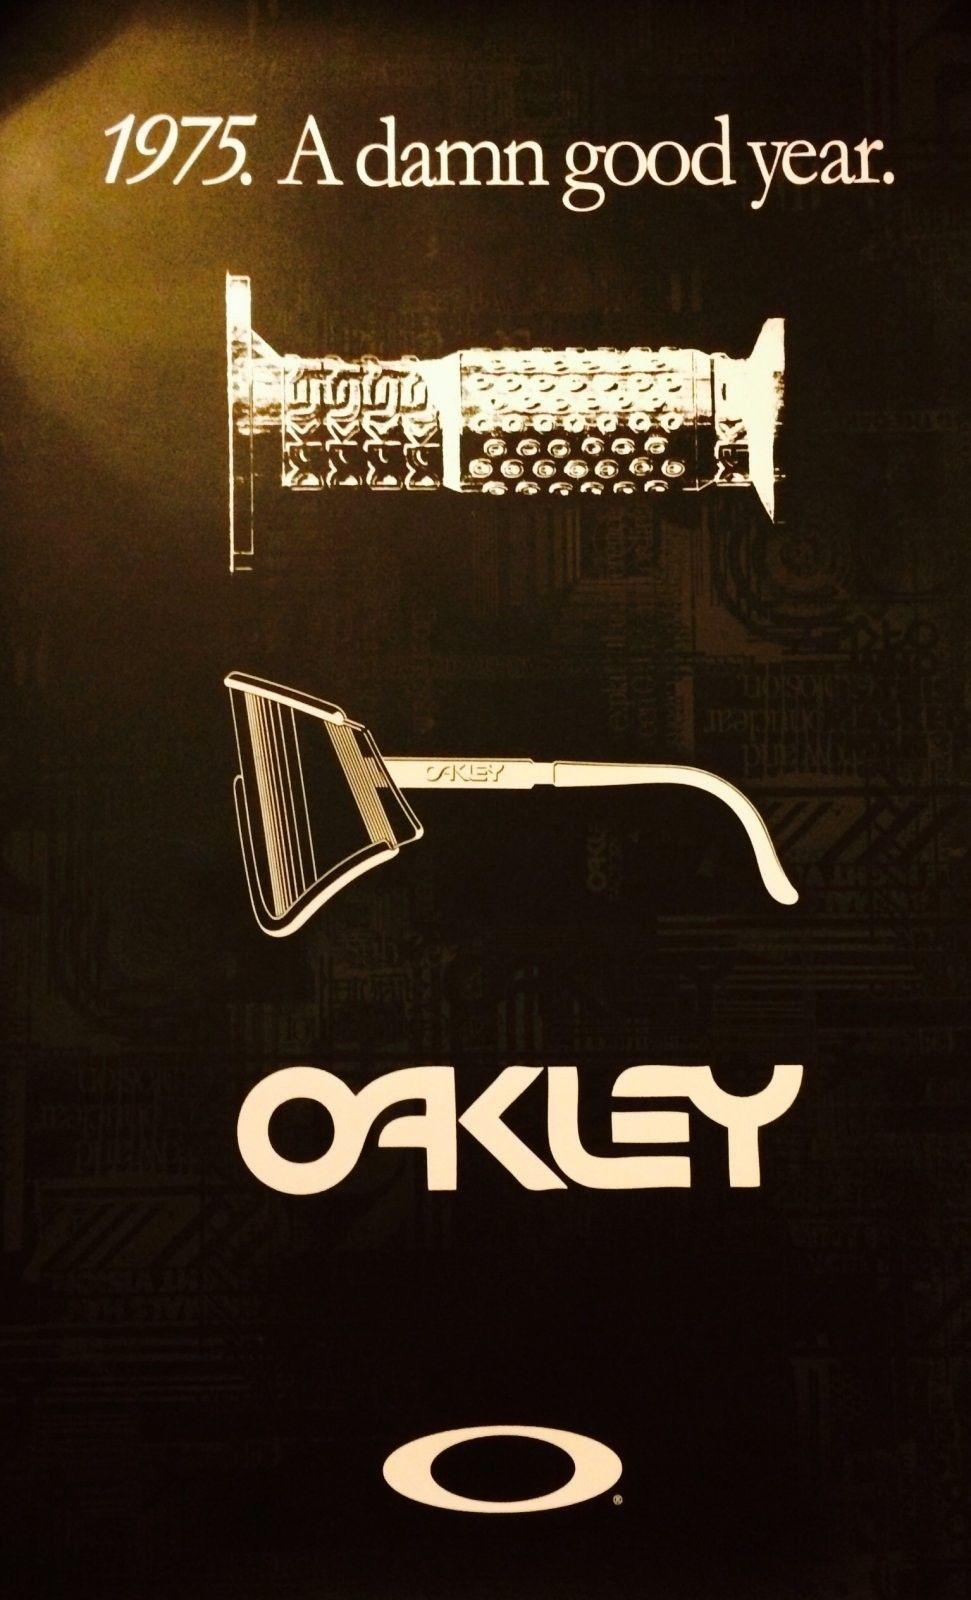 """1975. A Damn Good Year."" Oakley Eyeshades/B-1B Grips Anniversary Poster - image.jpg"